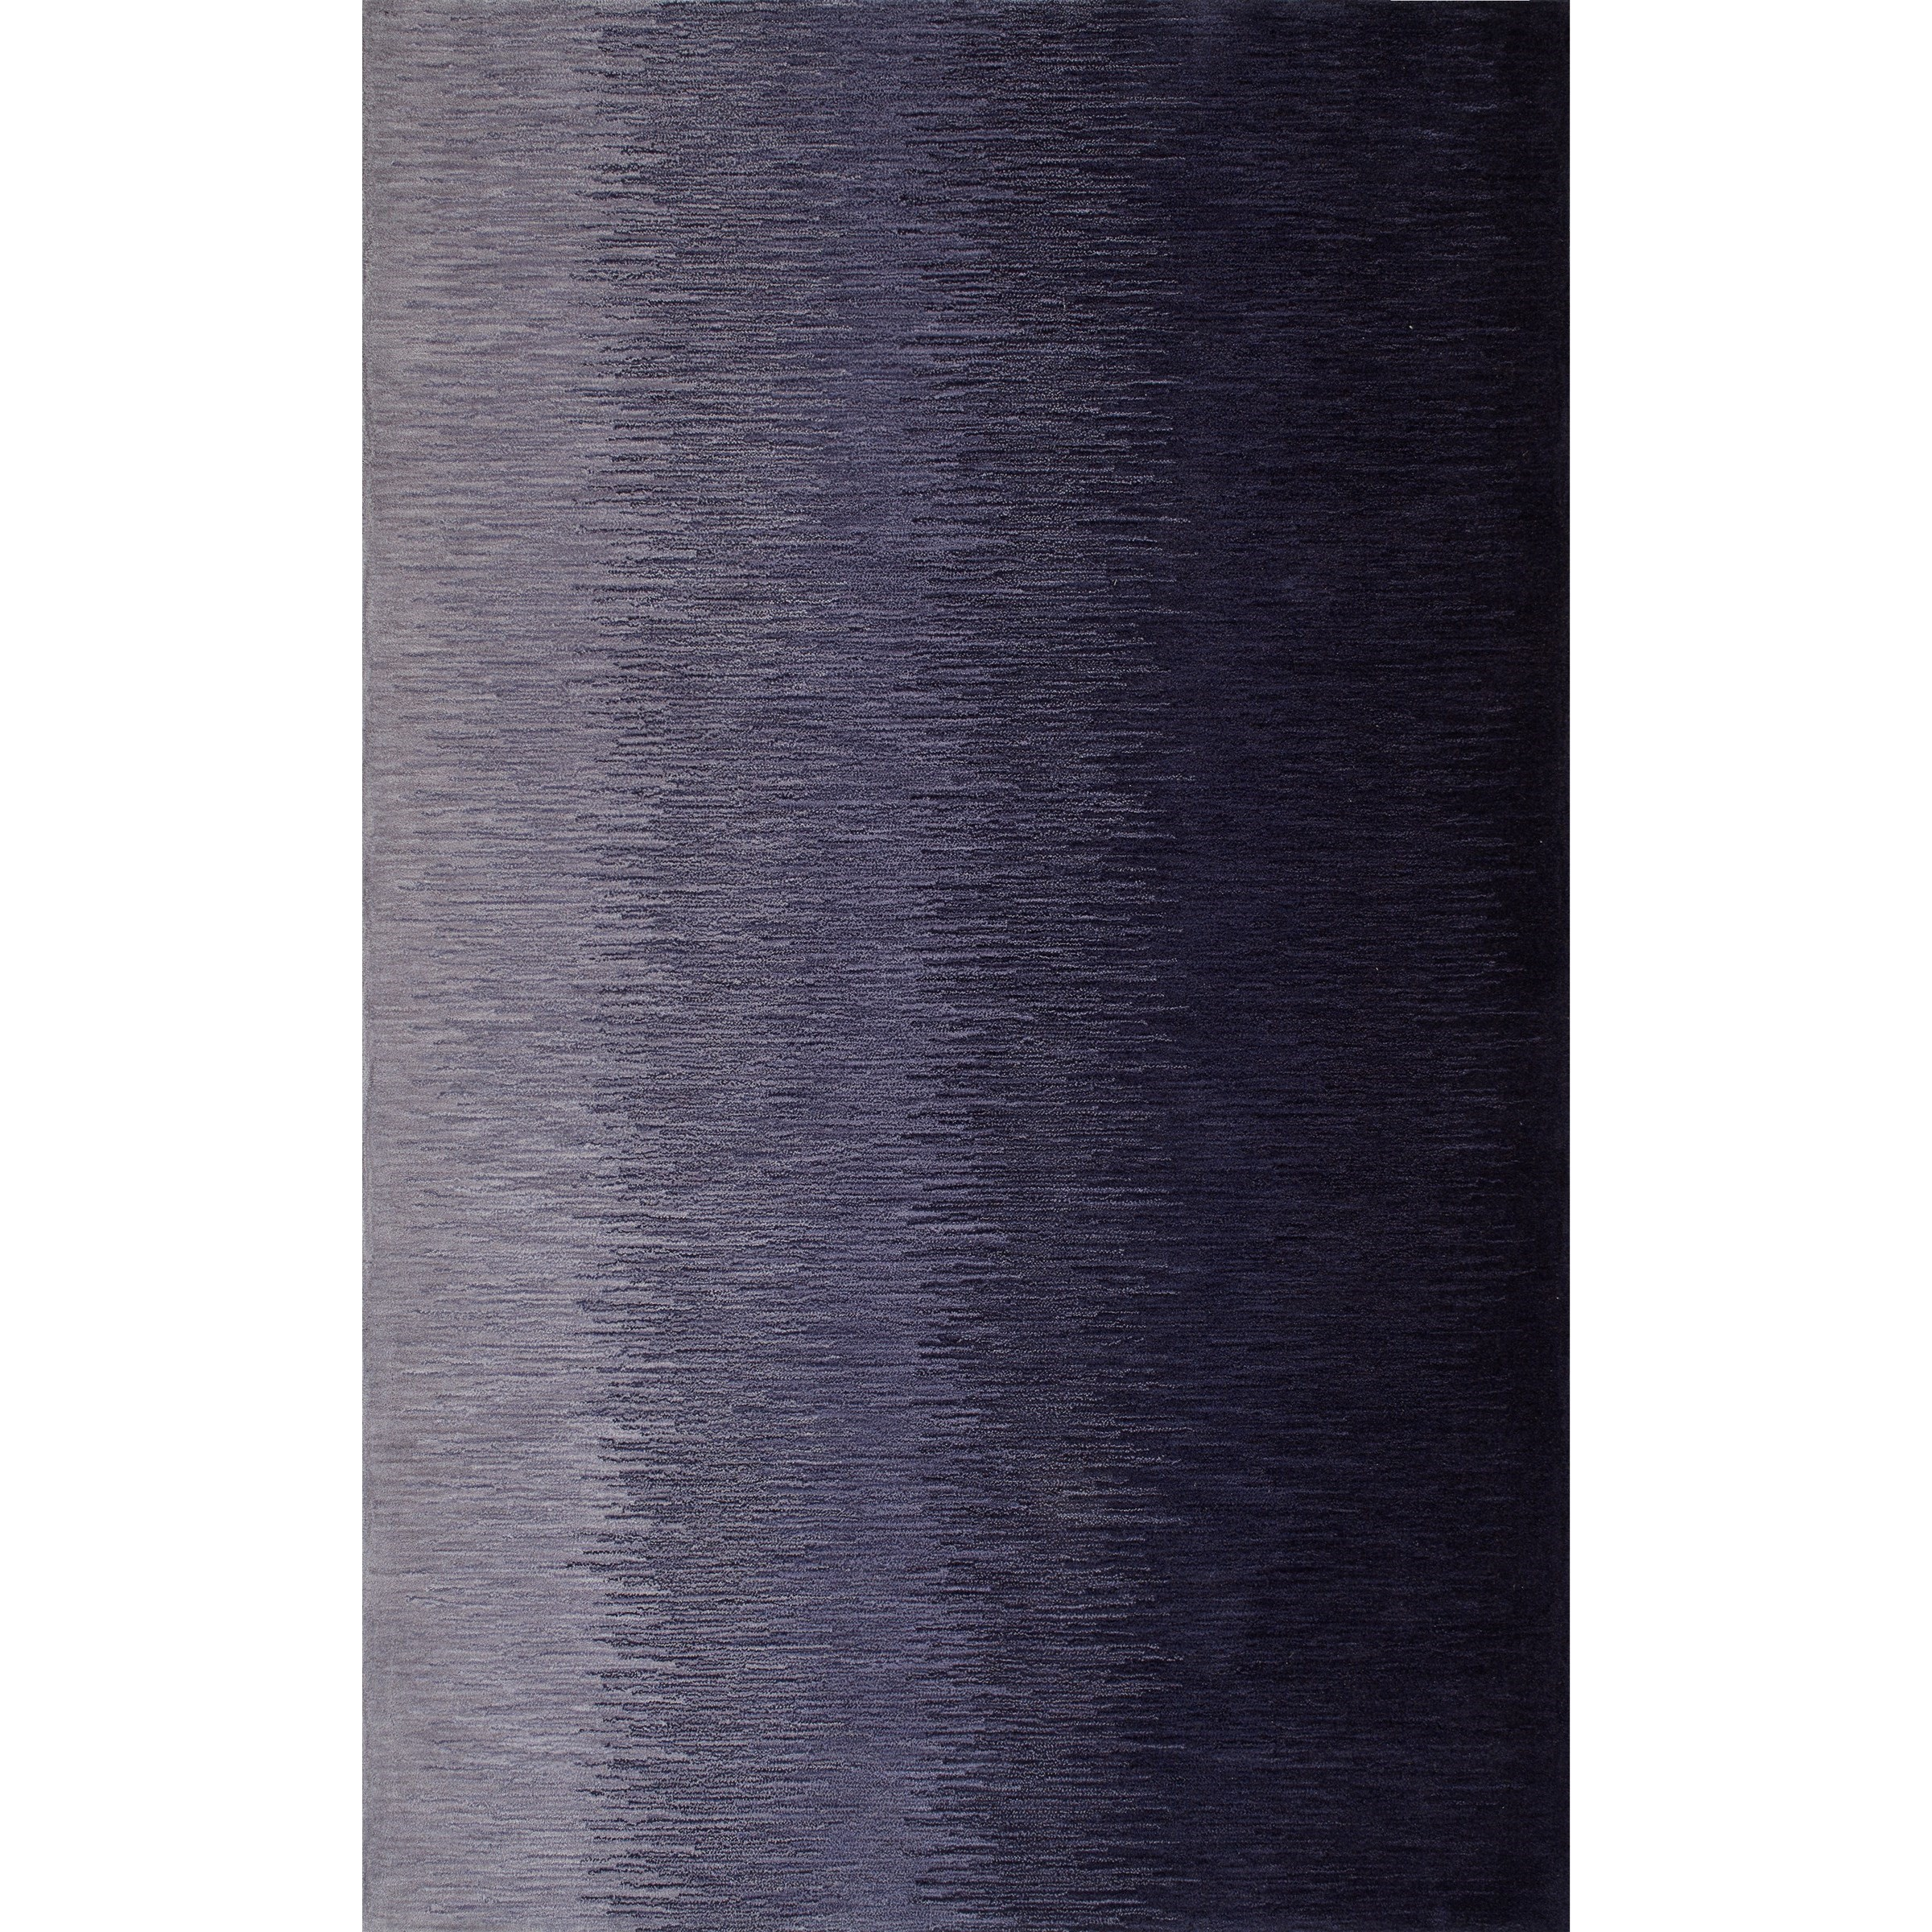 DelMar Amethyst 8'X10' Rug by Dalyn at Factory Direct Furniture